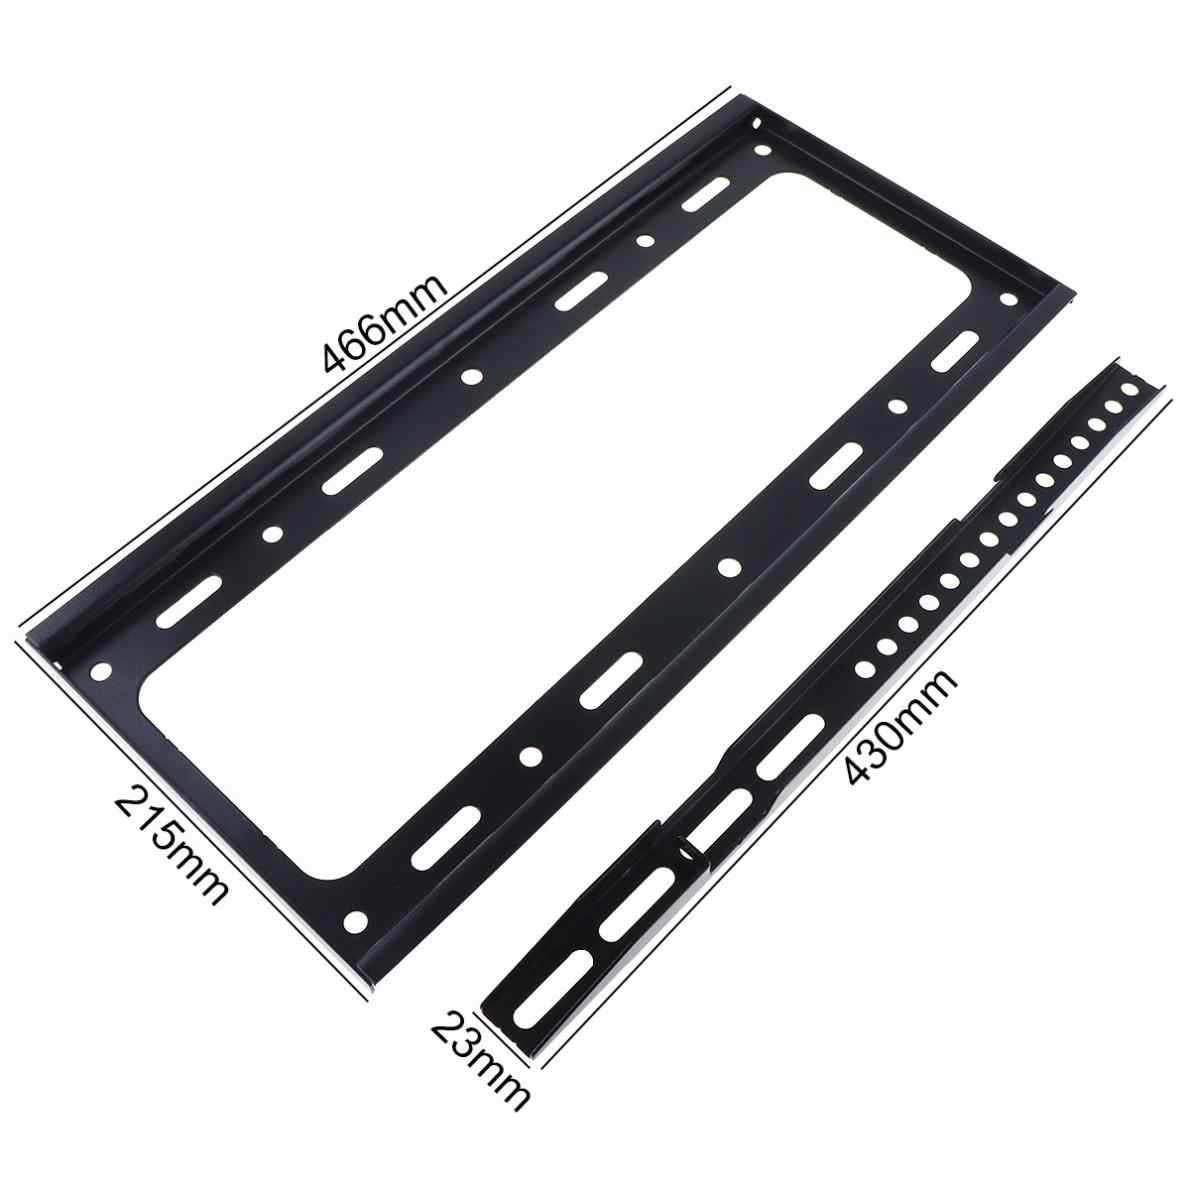 Universal TV Wall Mount Bracket สำหรับ 26 ~ 55 นิ้ว HDTV LCD LED Plasma FLAT PANEL TV Stand Holder